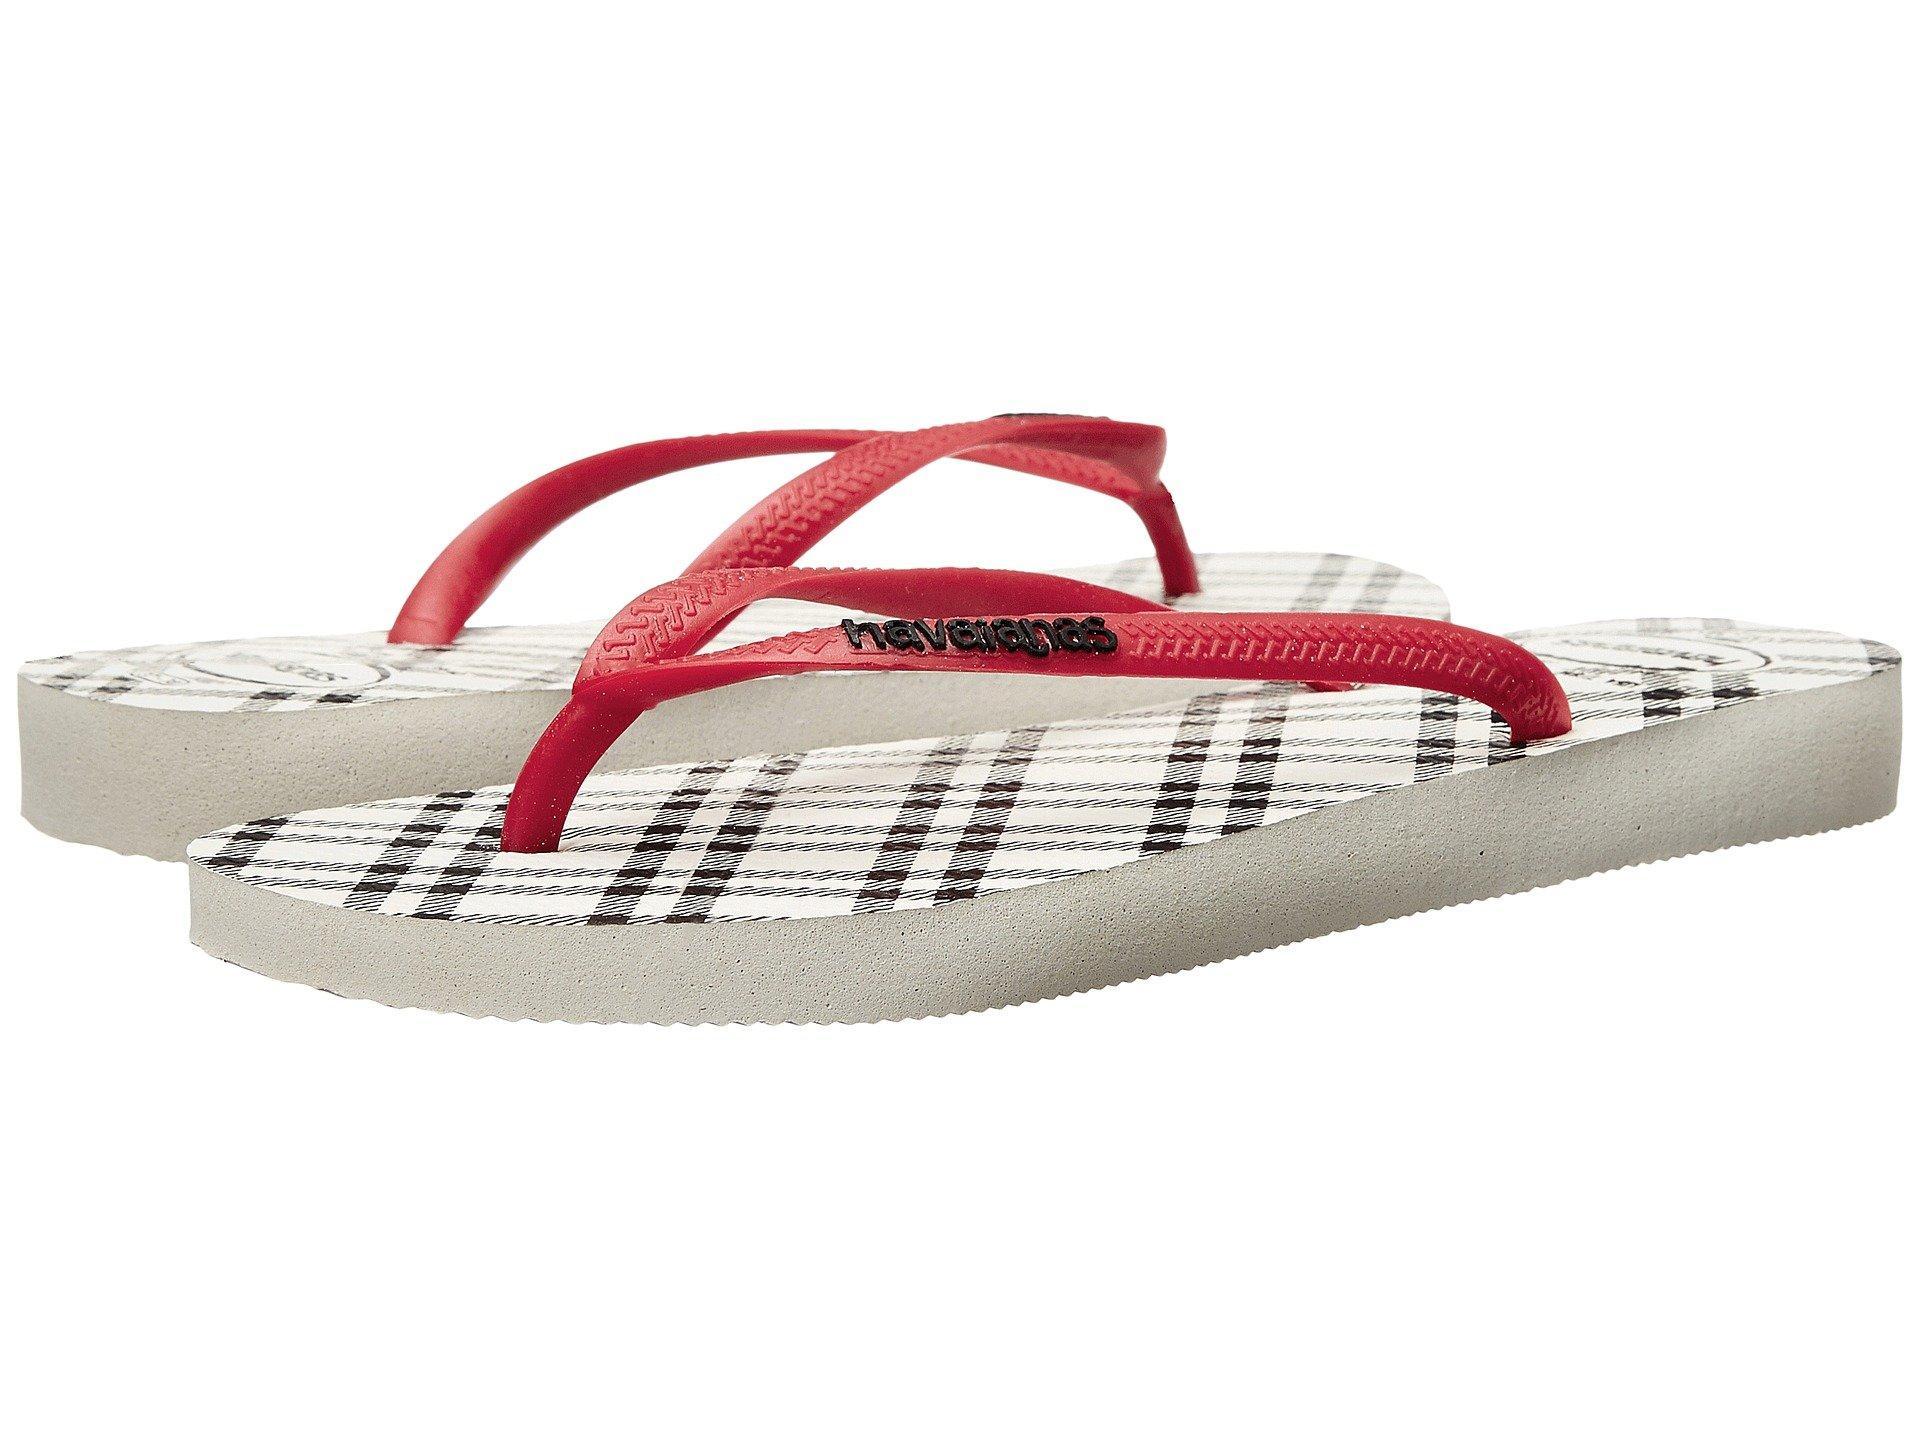 78342059aab5 Havaianas Slim Retro Flip Flops In White Red